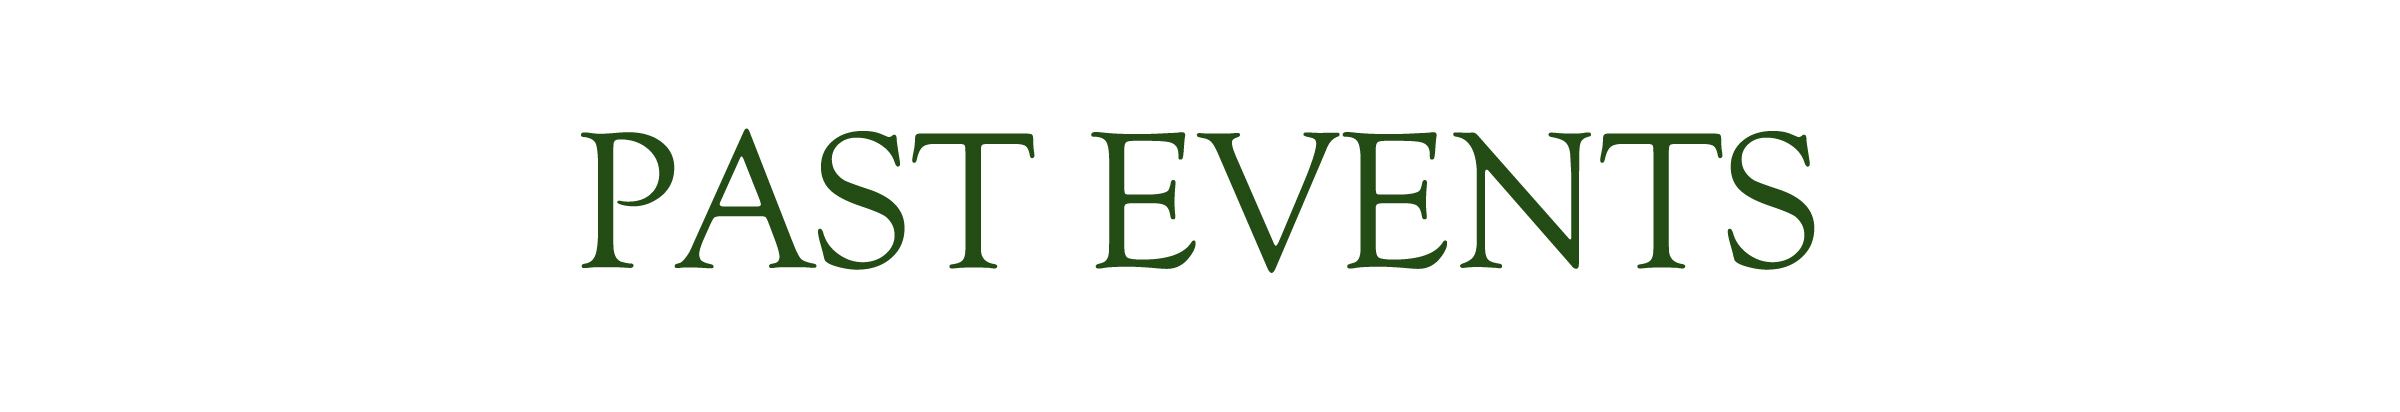 WEBSITE - PAST EVENTS Header.jpg